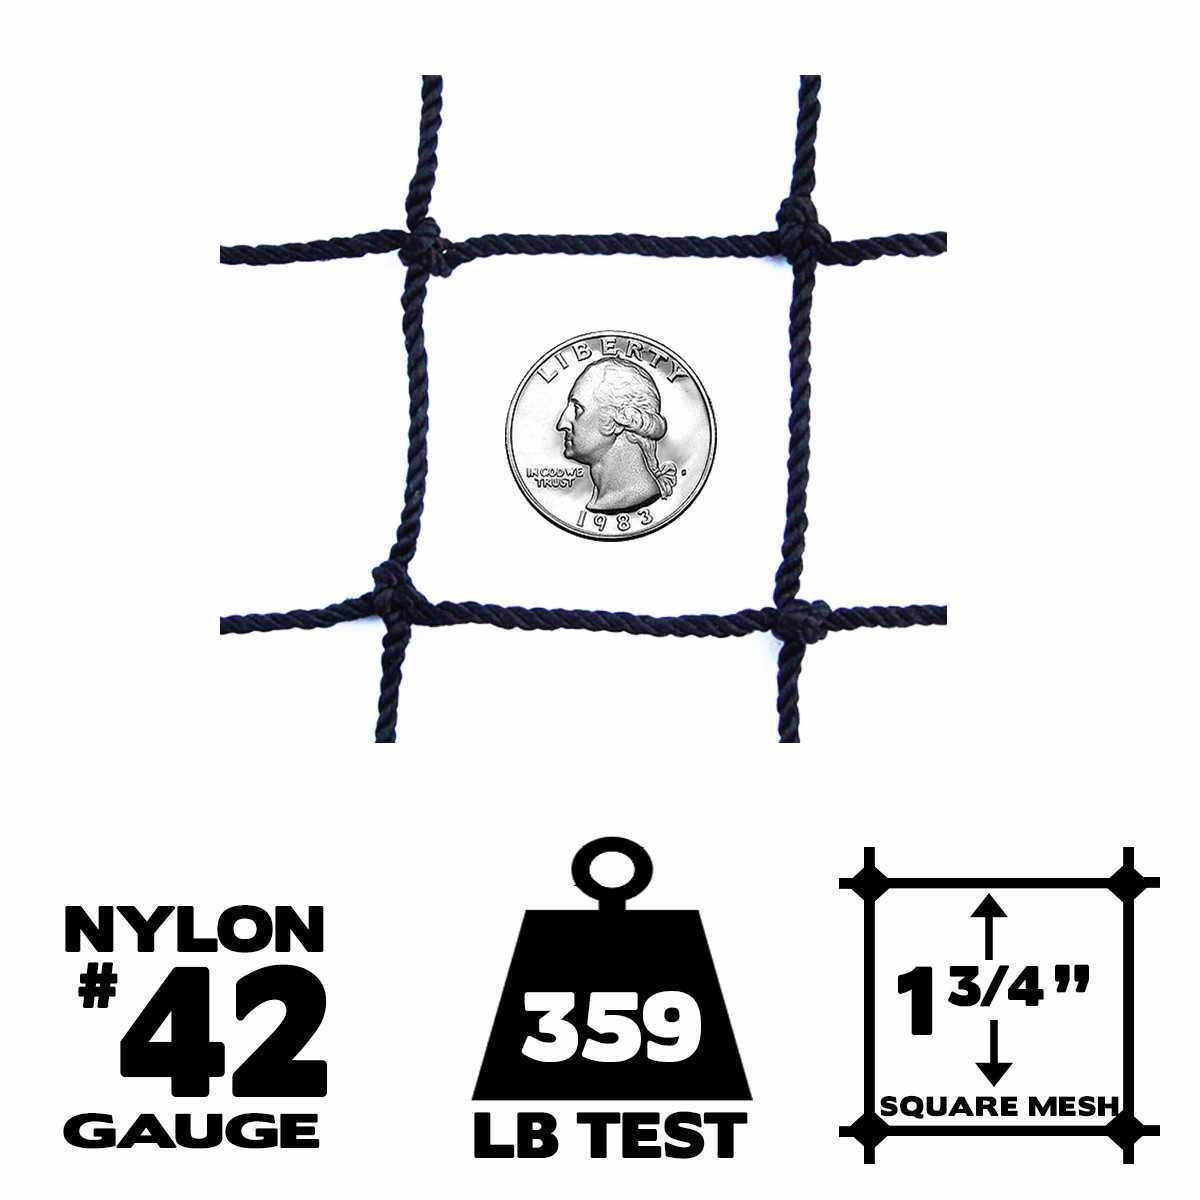 Netting - 10' x 10',  42 Gauge, Baseball / Softball Panel Net (Choose Border)